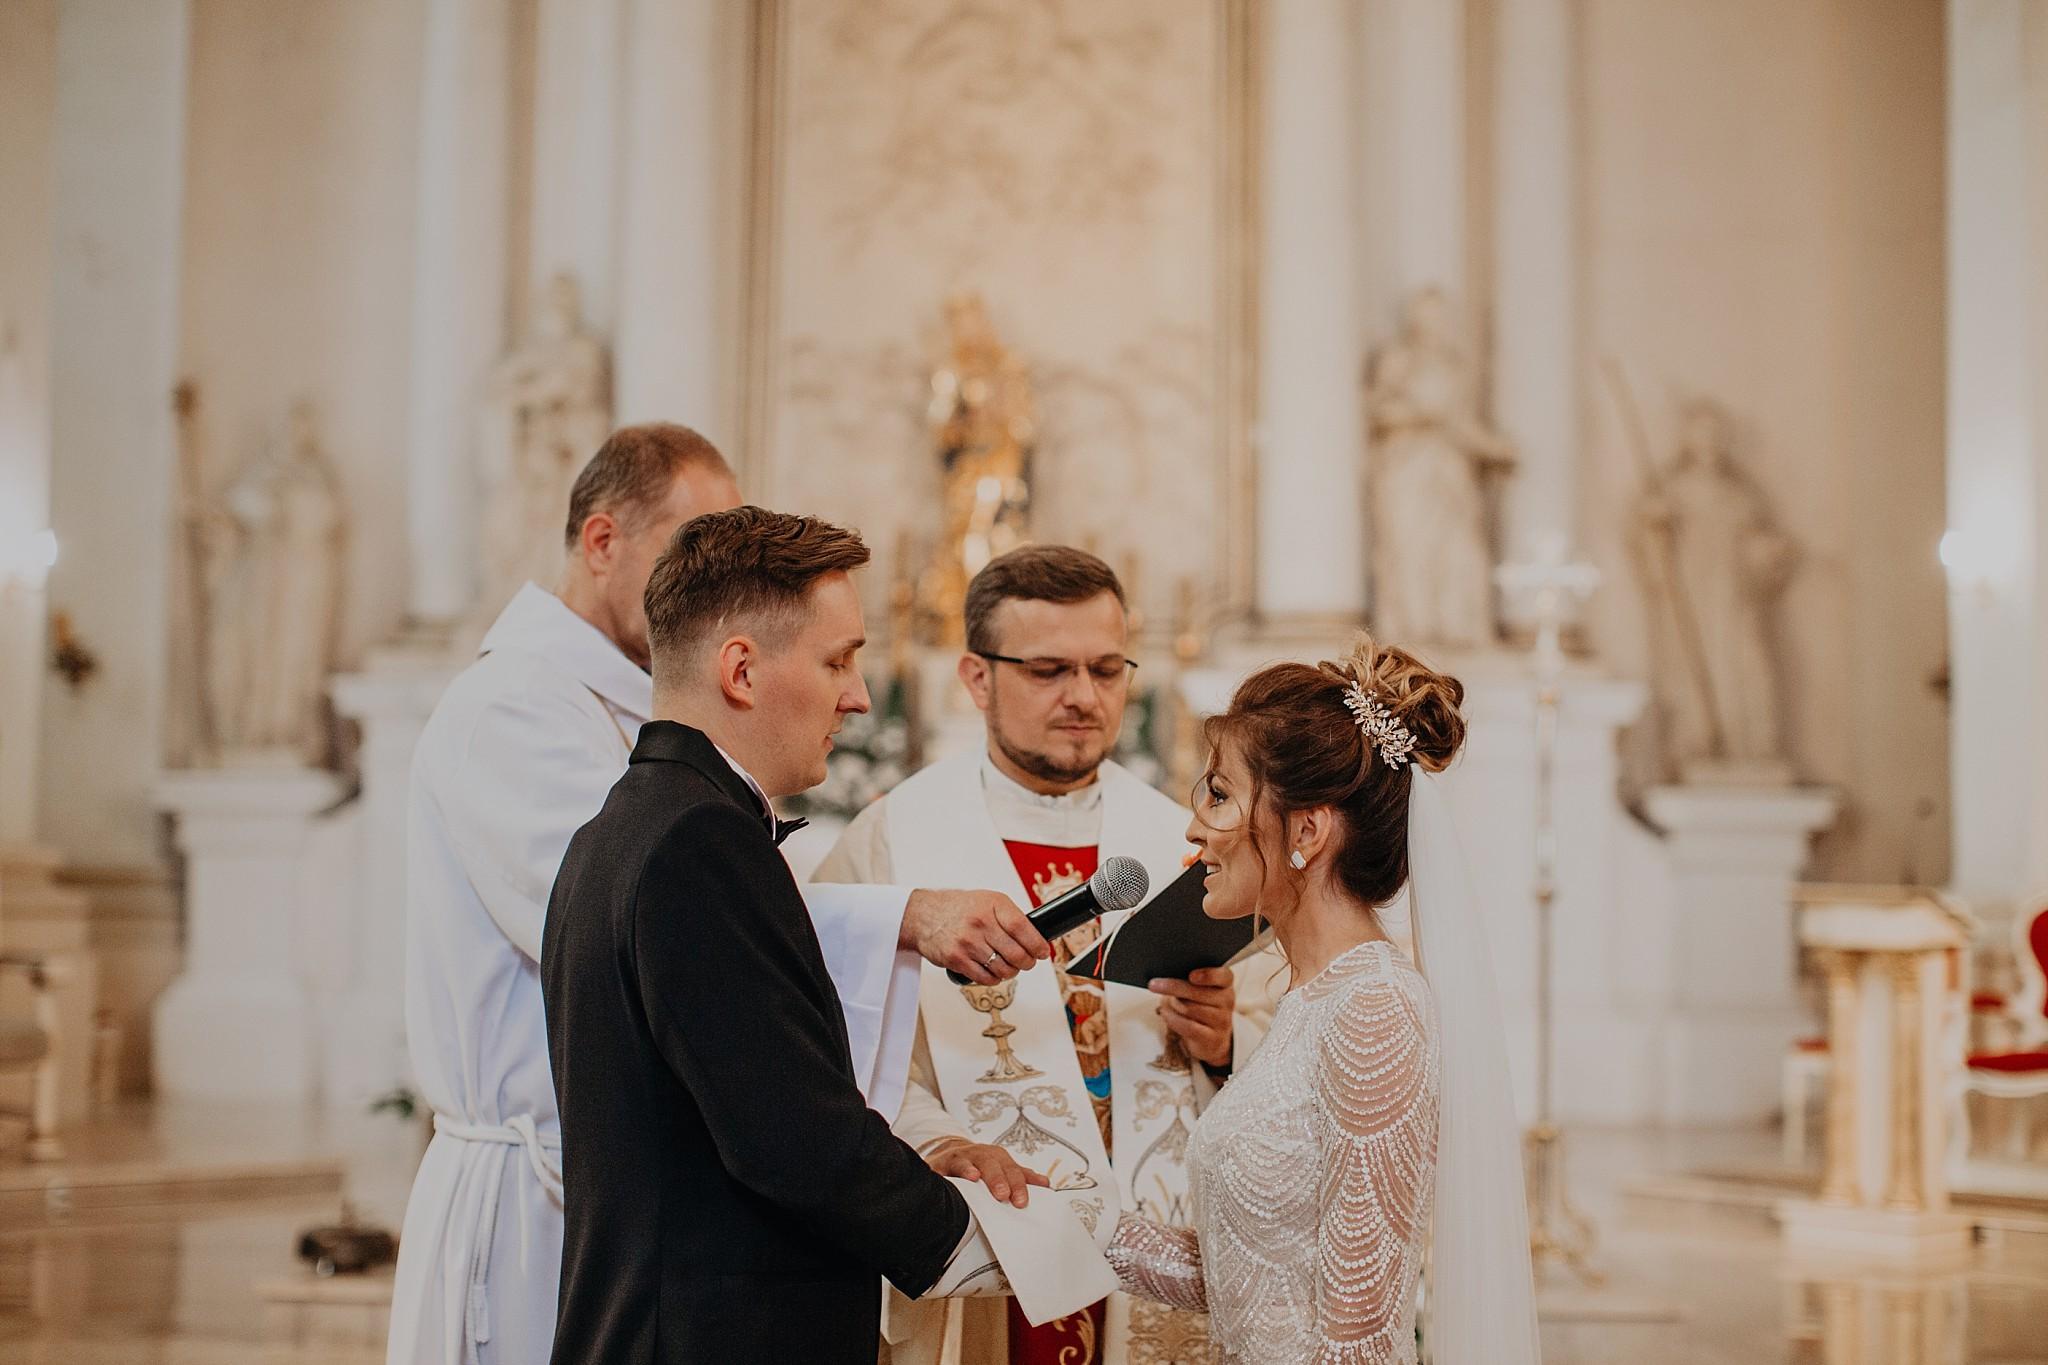 fotograf poznan wesele dobra truskawka piekne wesele pod poznaniem wesele w dobrej truskawce piekna para mloda slub marzen slub koronawirus slub listopad wesele koronawirus 173